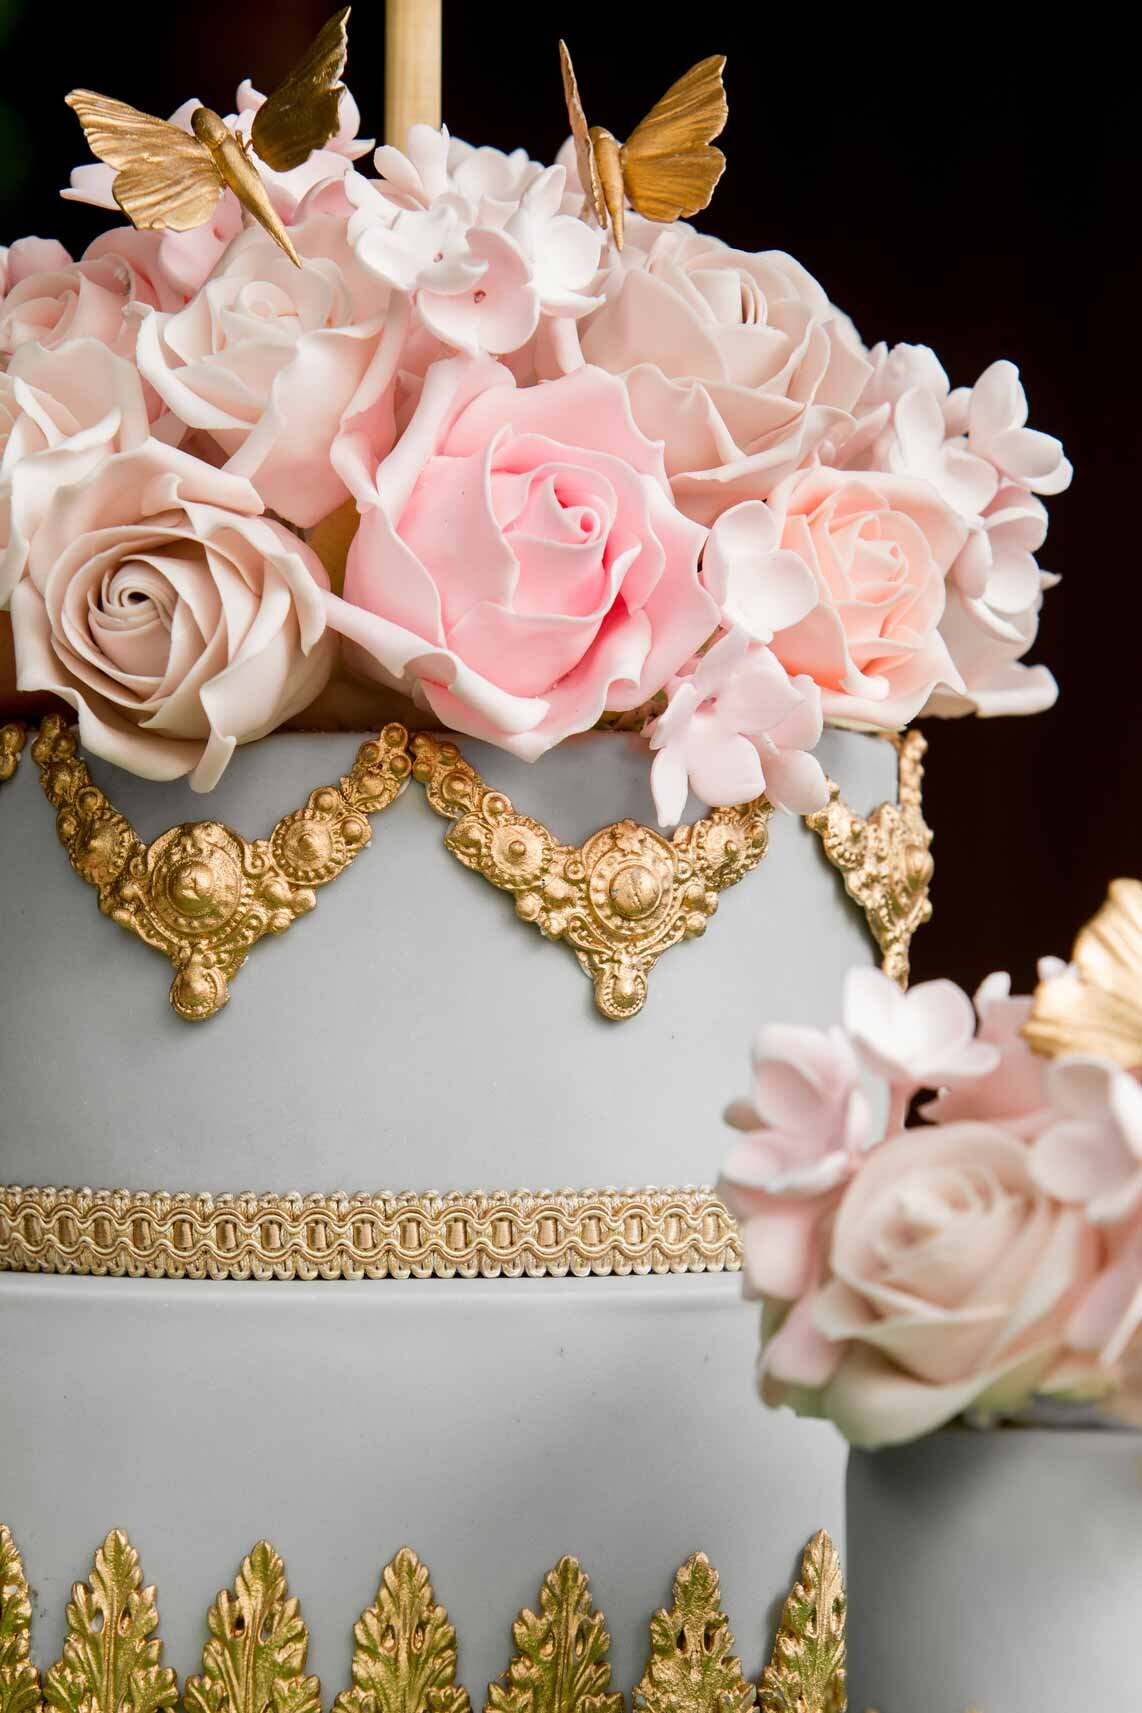 baroque-topiary-cake-detail.jpg